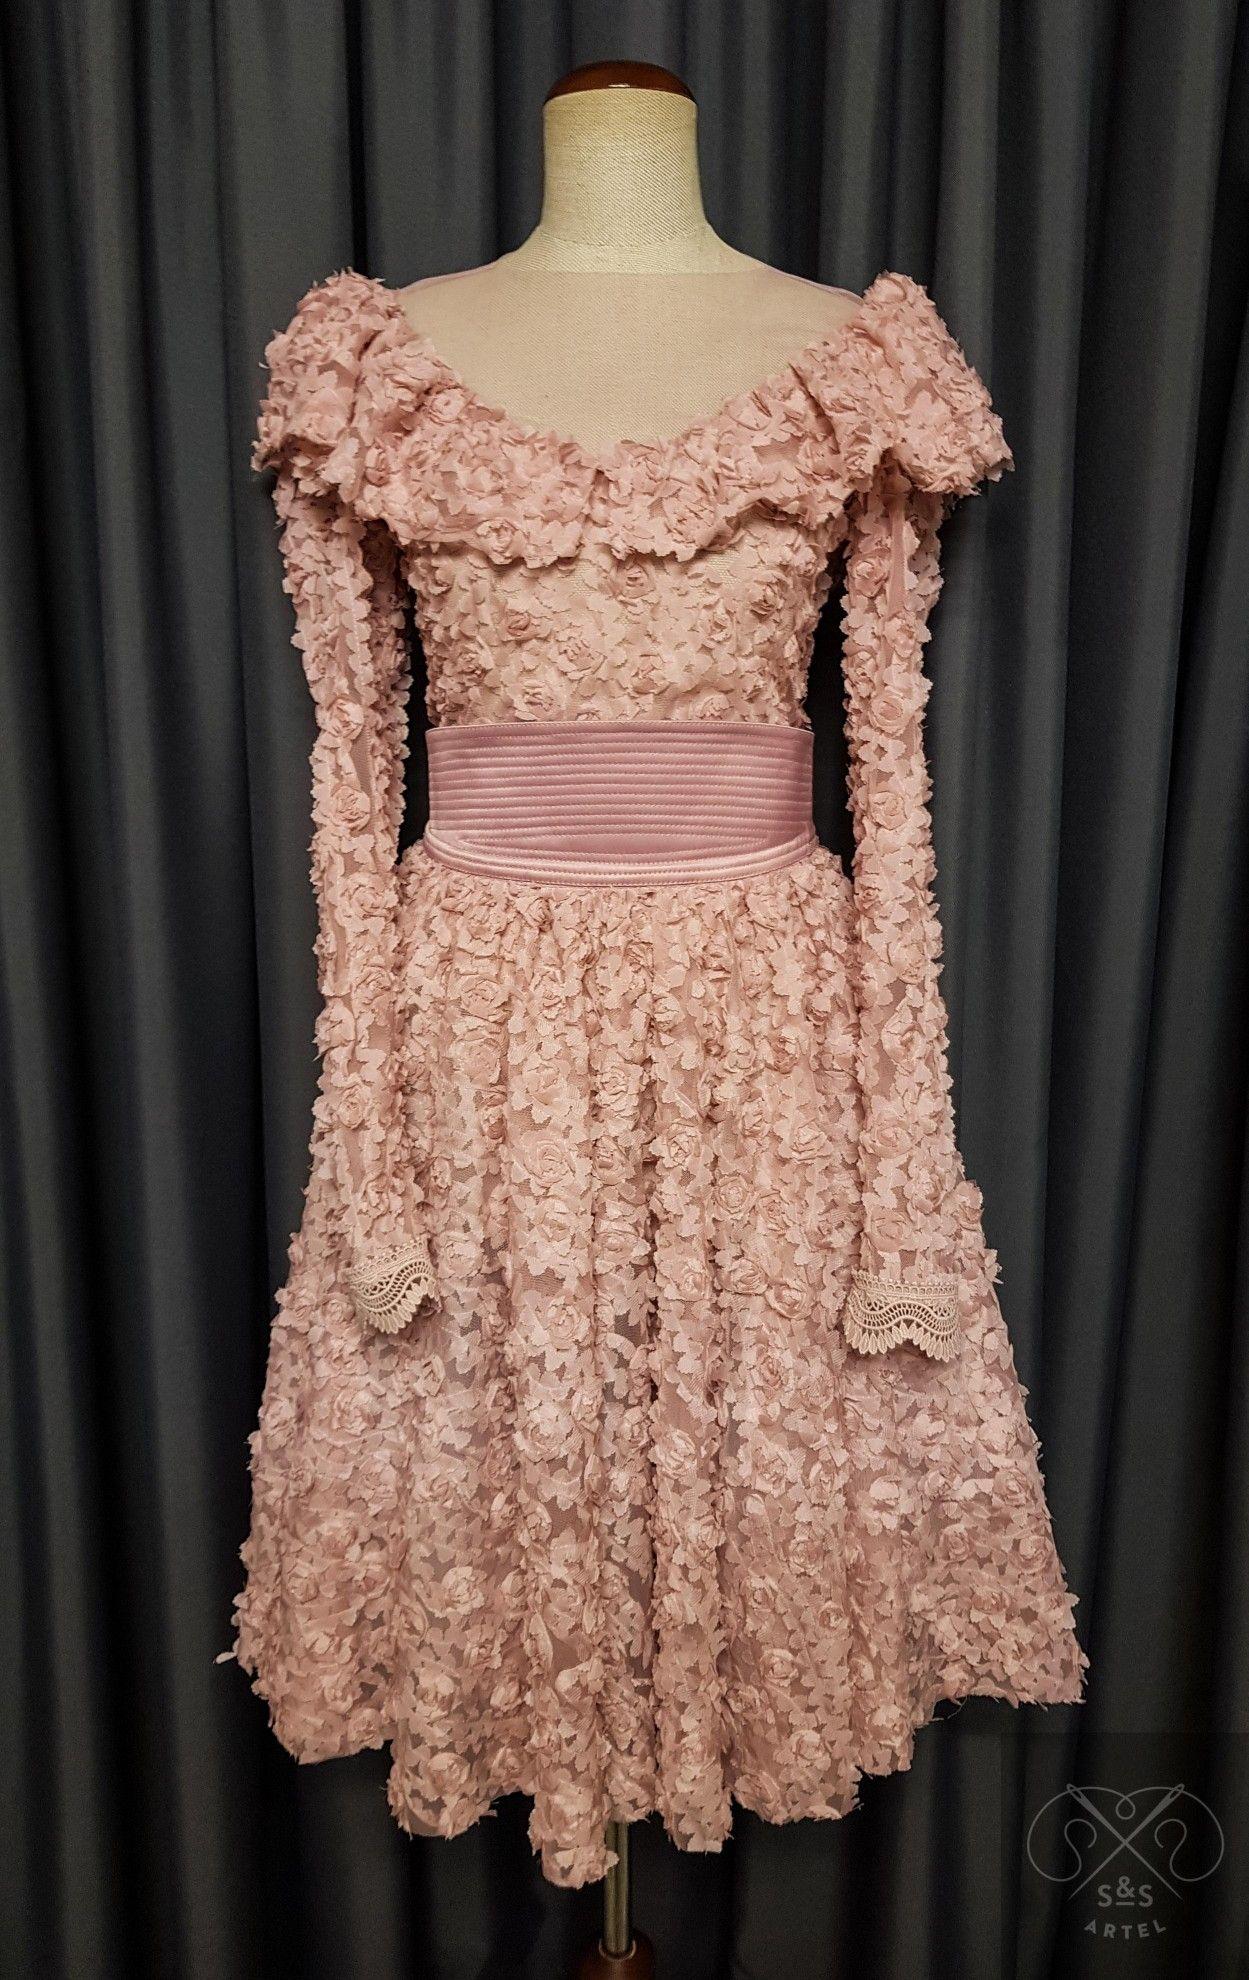 Elegant Pink Wedding Guest Dress Pink Wedding Guest Dresses Cotton Dress Summer Wedding Guest Skirt [ 1980 x 1249 Pixel ]